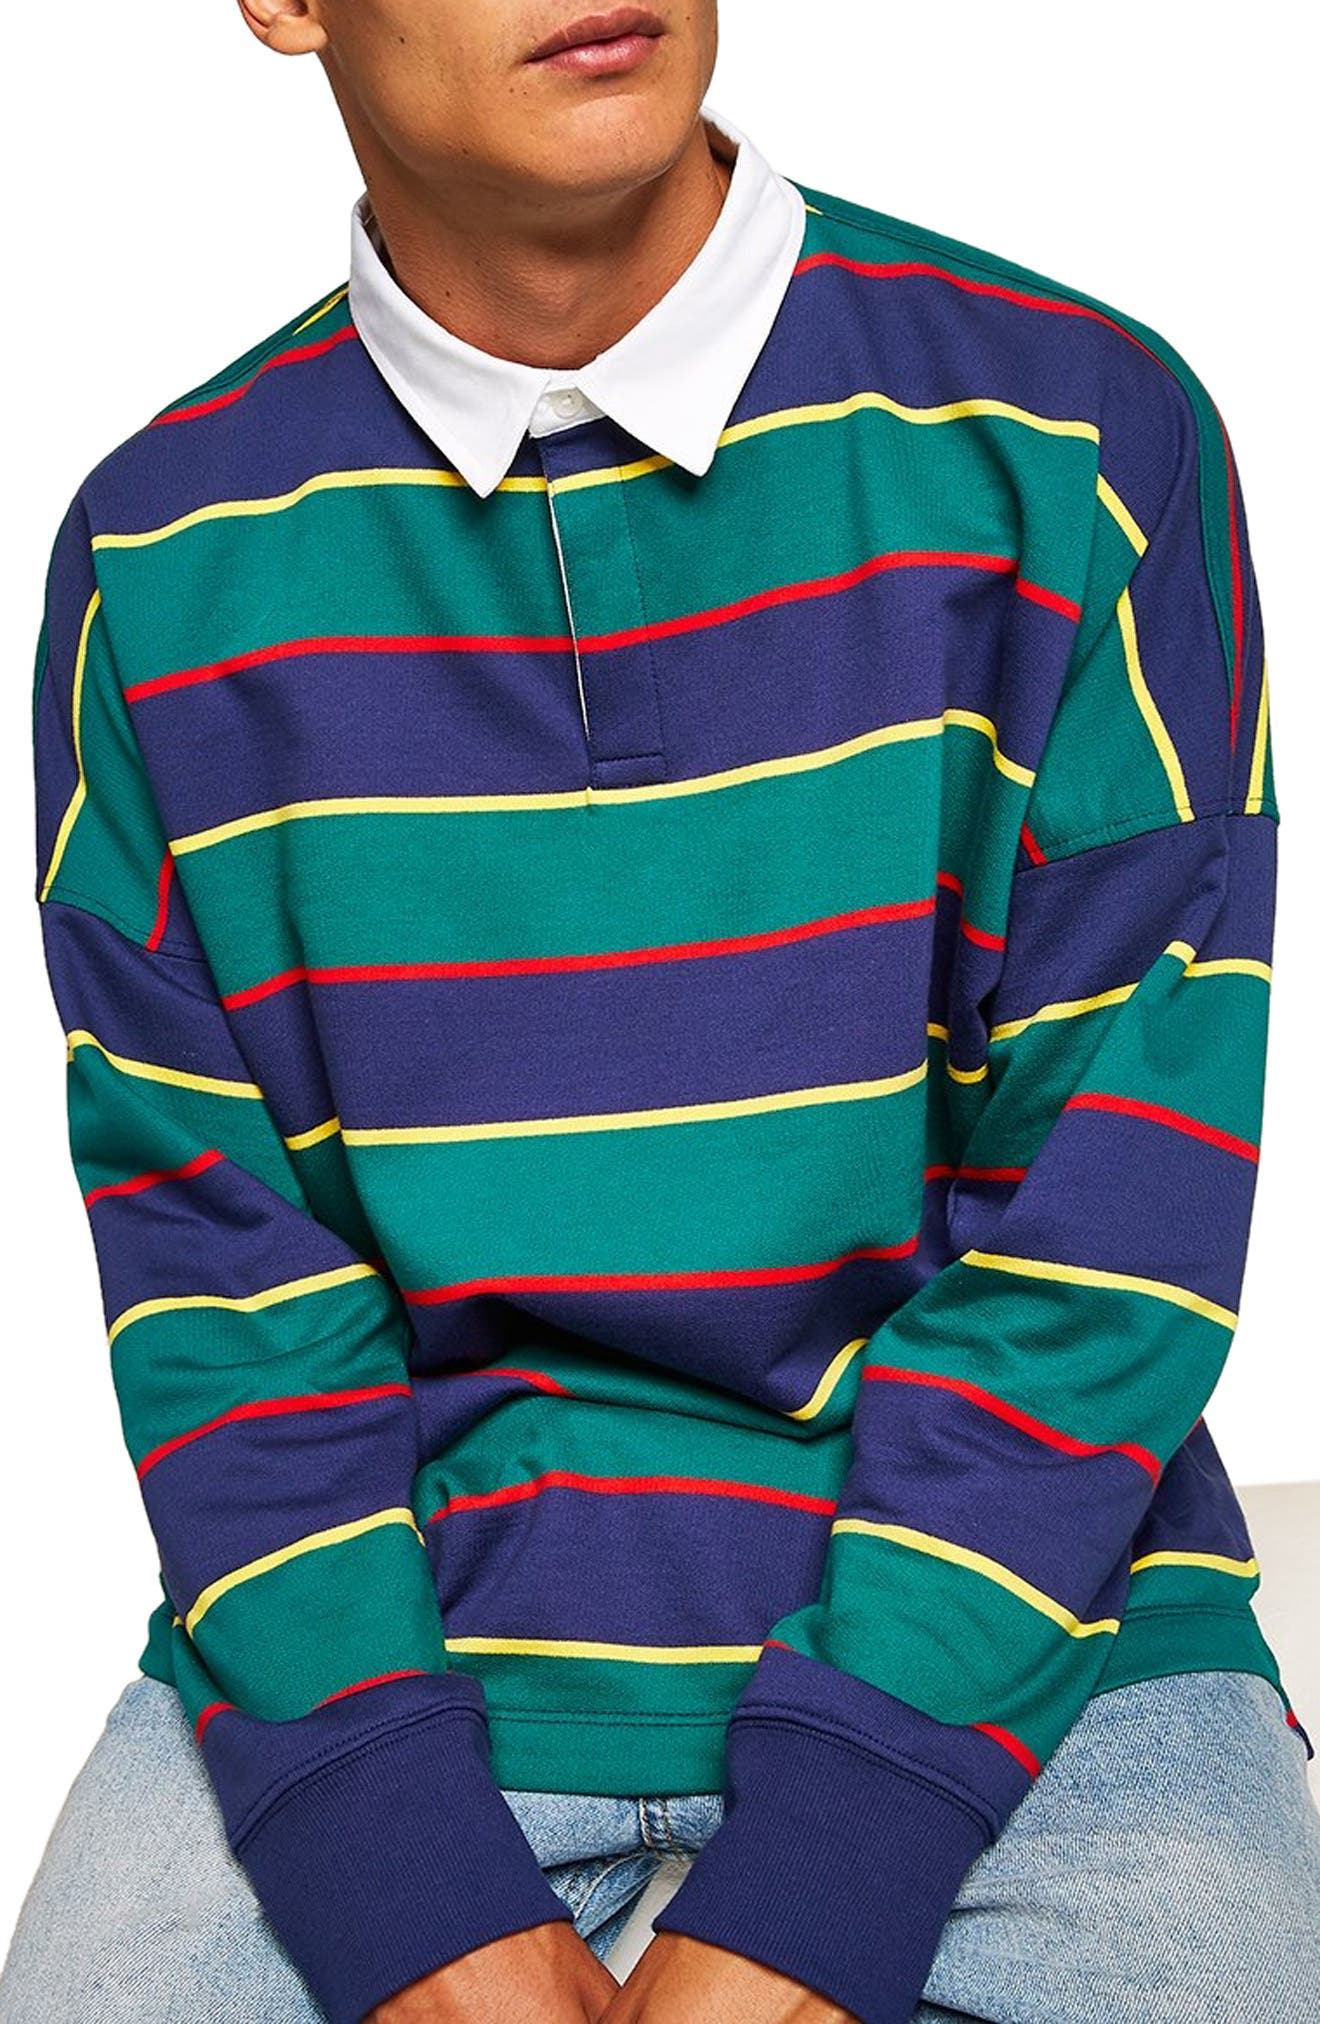 Rugby Stripe Shirt,                             Main thumbnail 1, color,                             GREEN MULTI